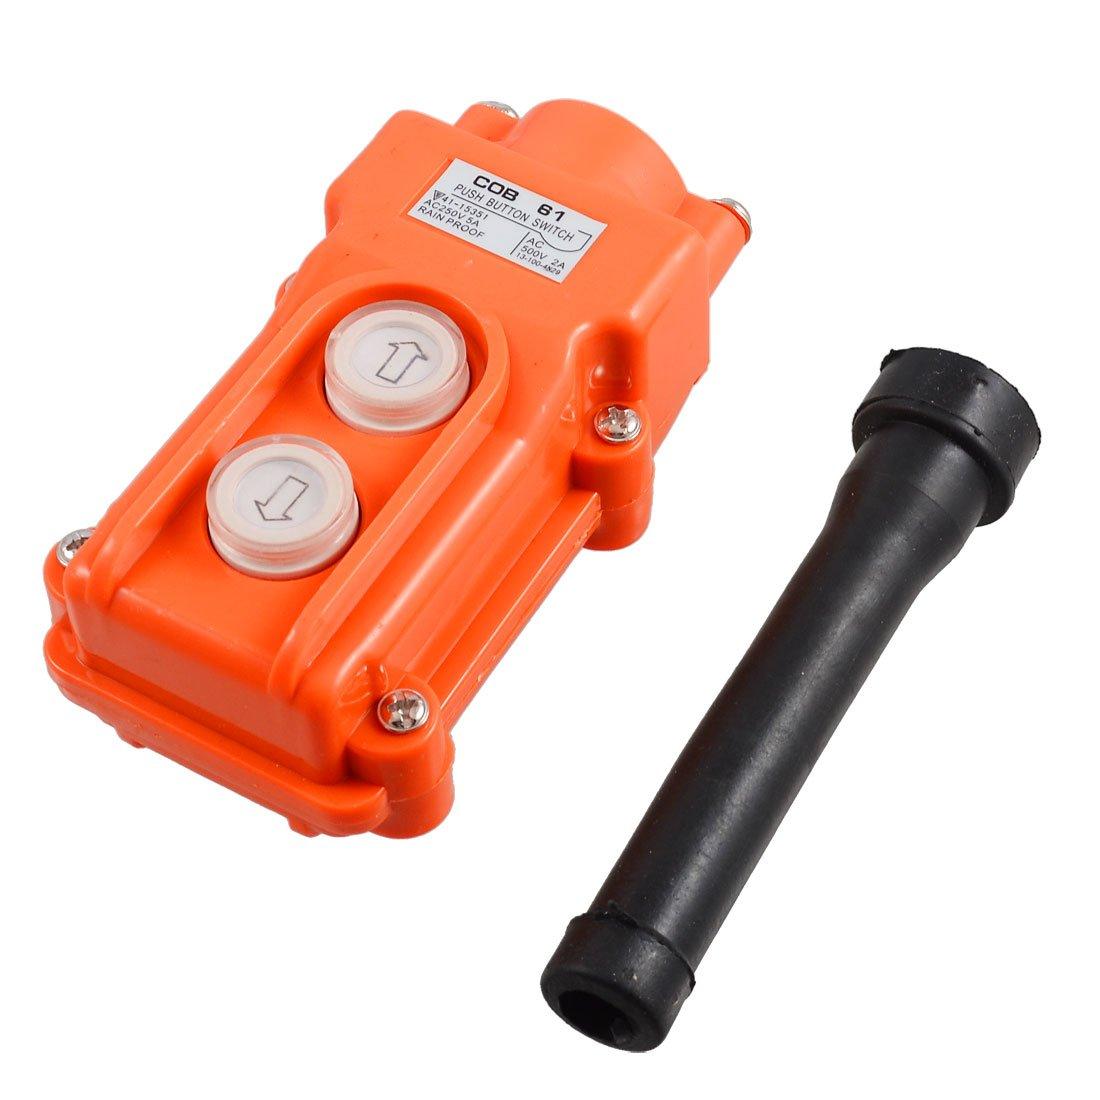 Uxcell a12060500ux0973 2 Ways Hoist Crane Push Button Switch, 250V, 5 Amp, 500V, 2 Amp, Orange